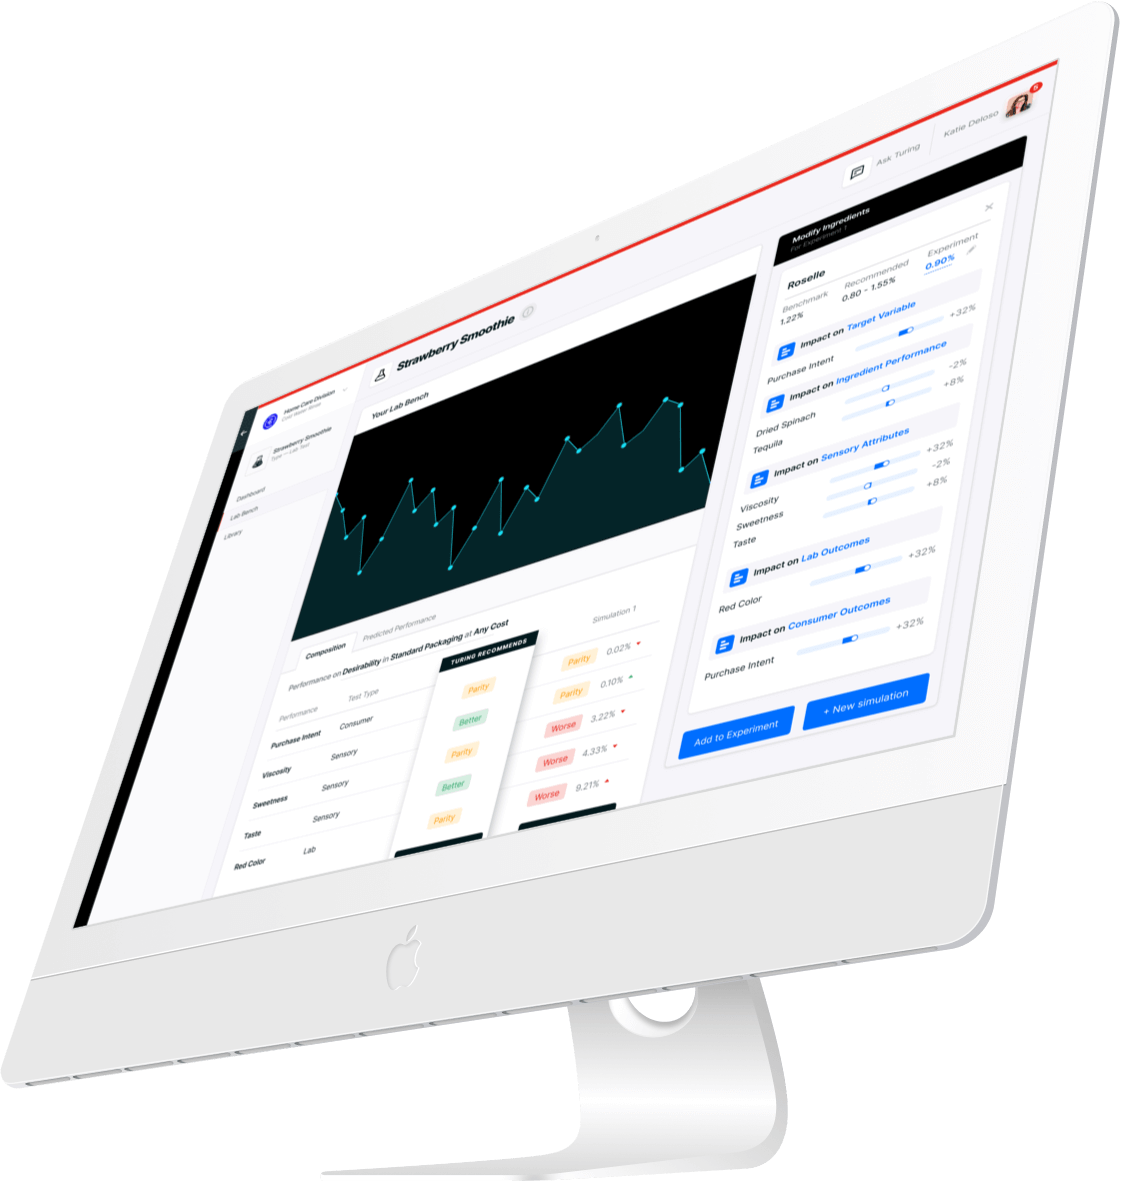 Turing Platform Overview